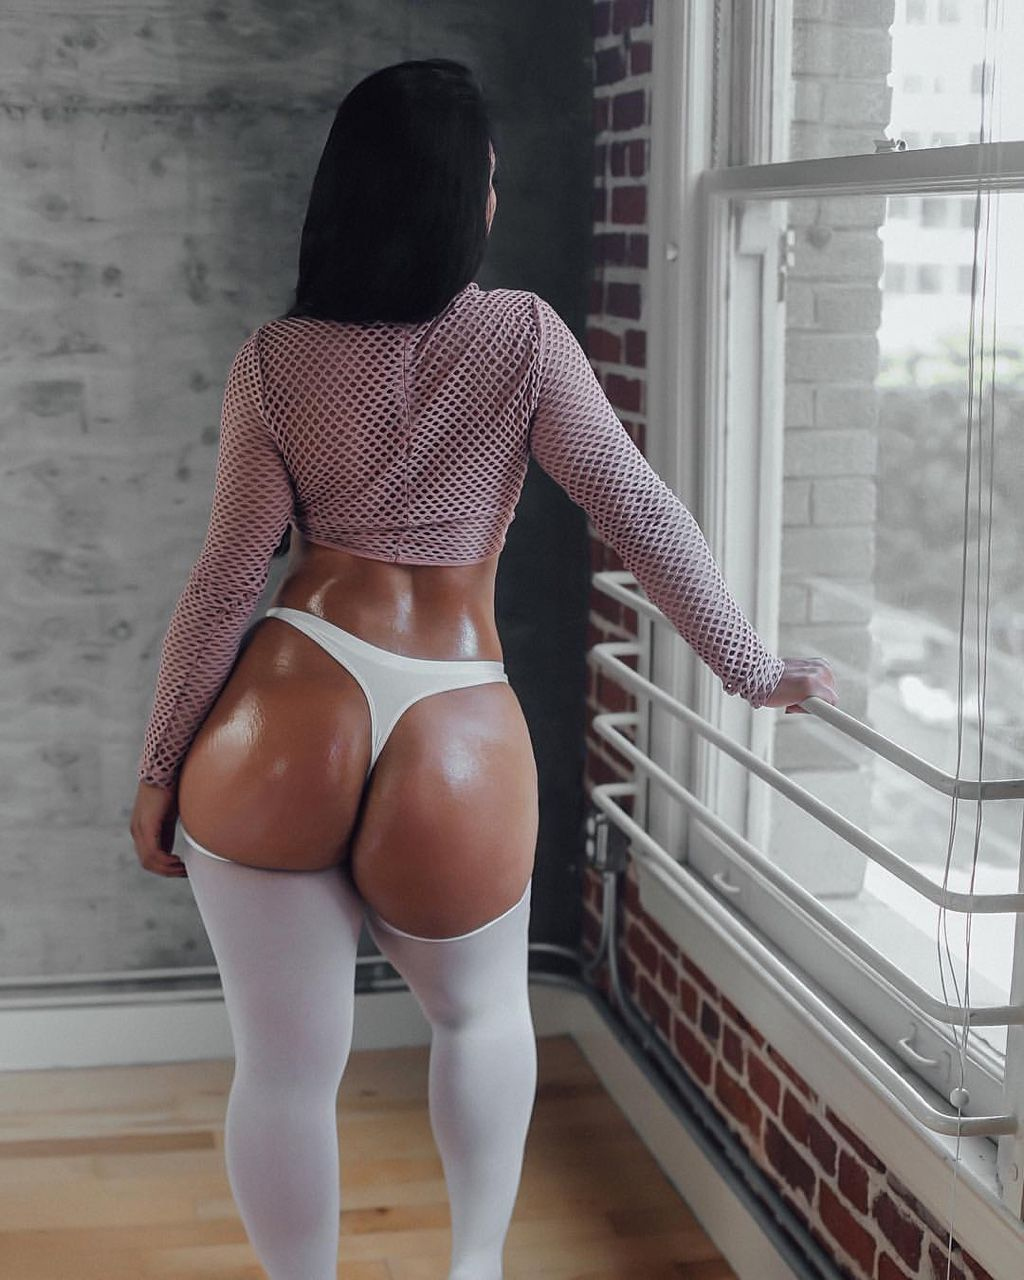 Tight black skirt bent over